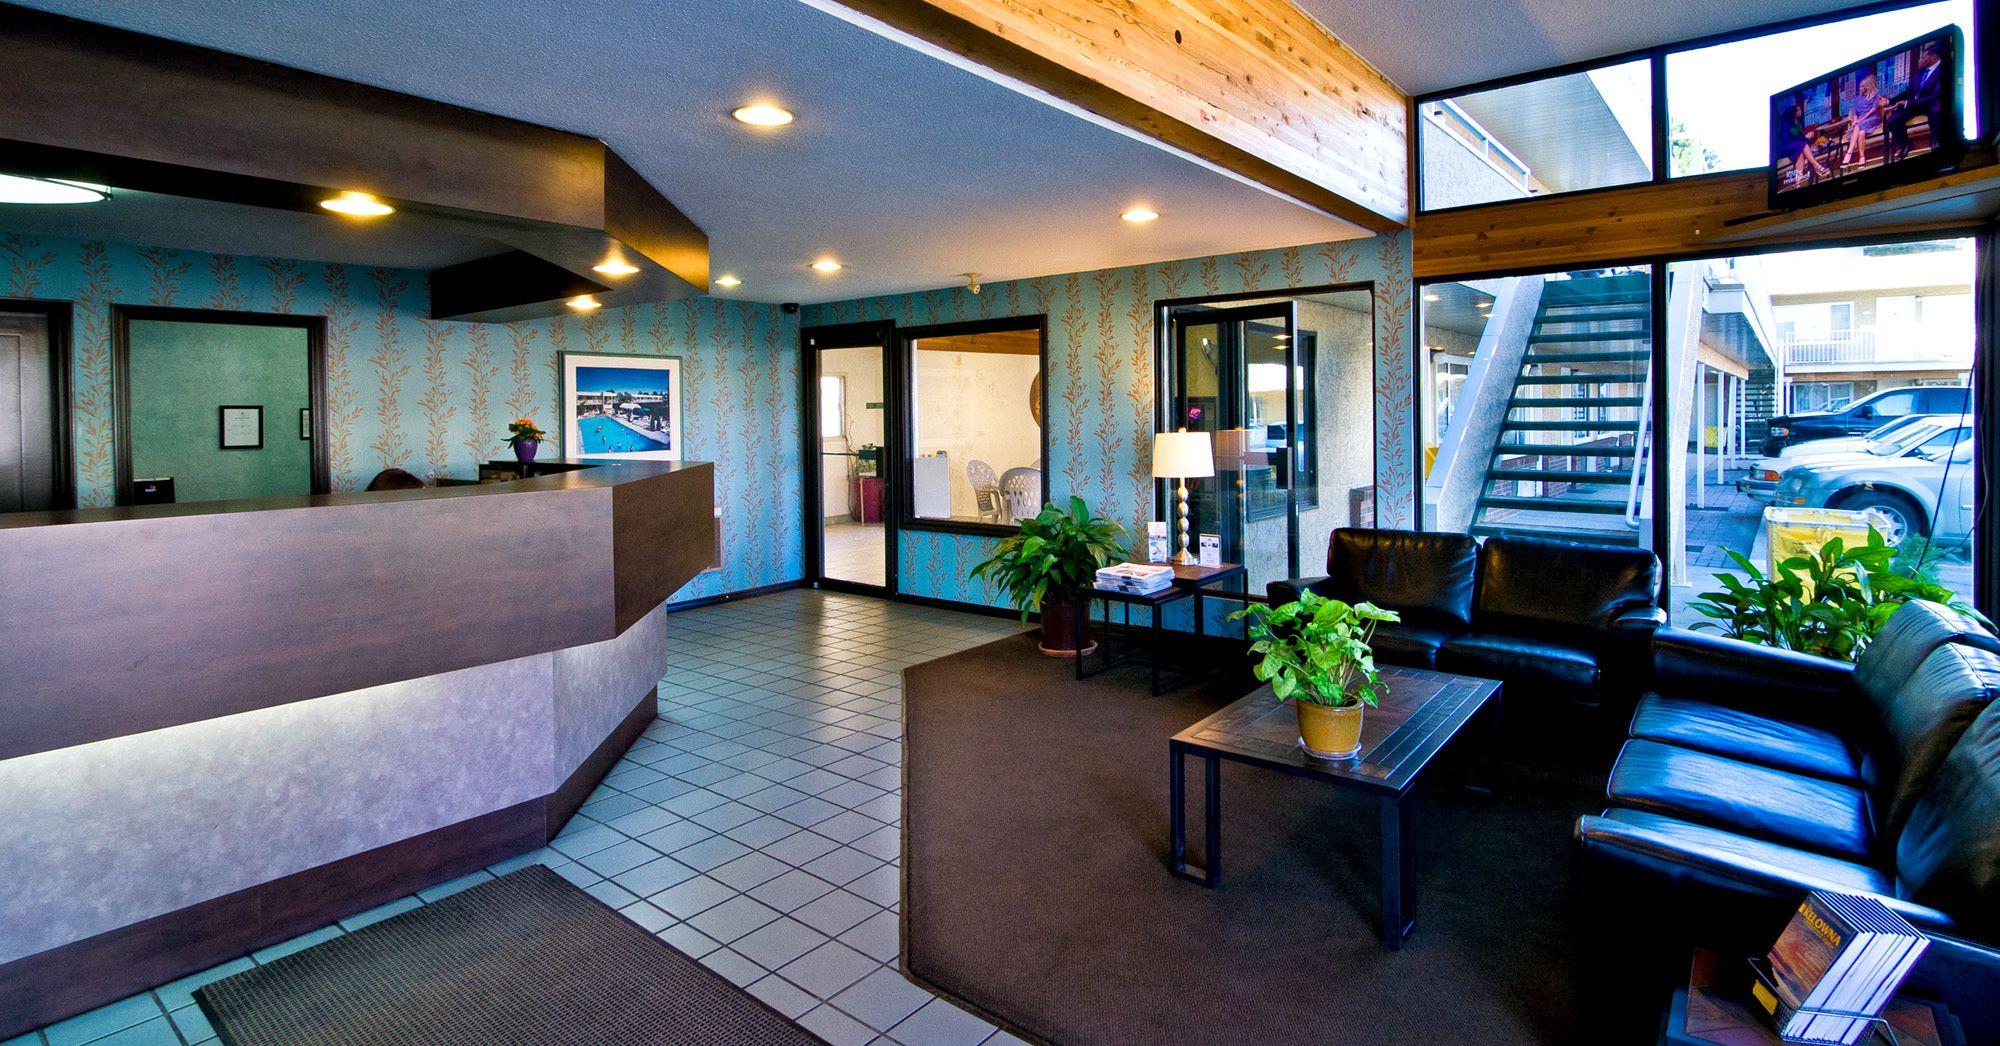 Siesta Hotel Kelowna Bc